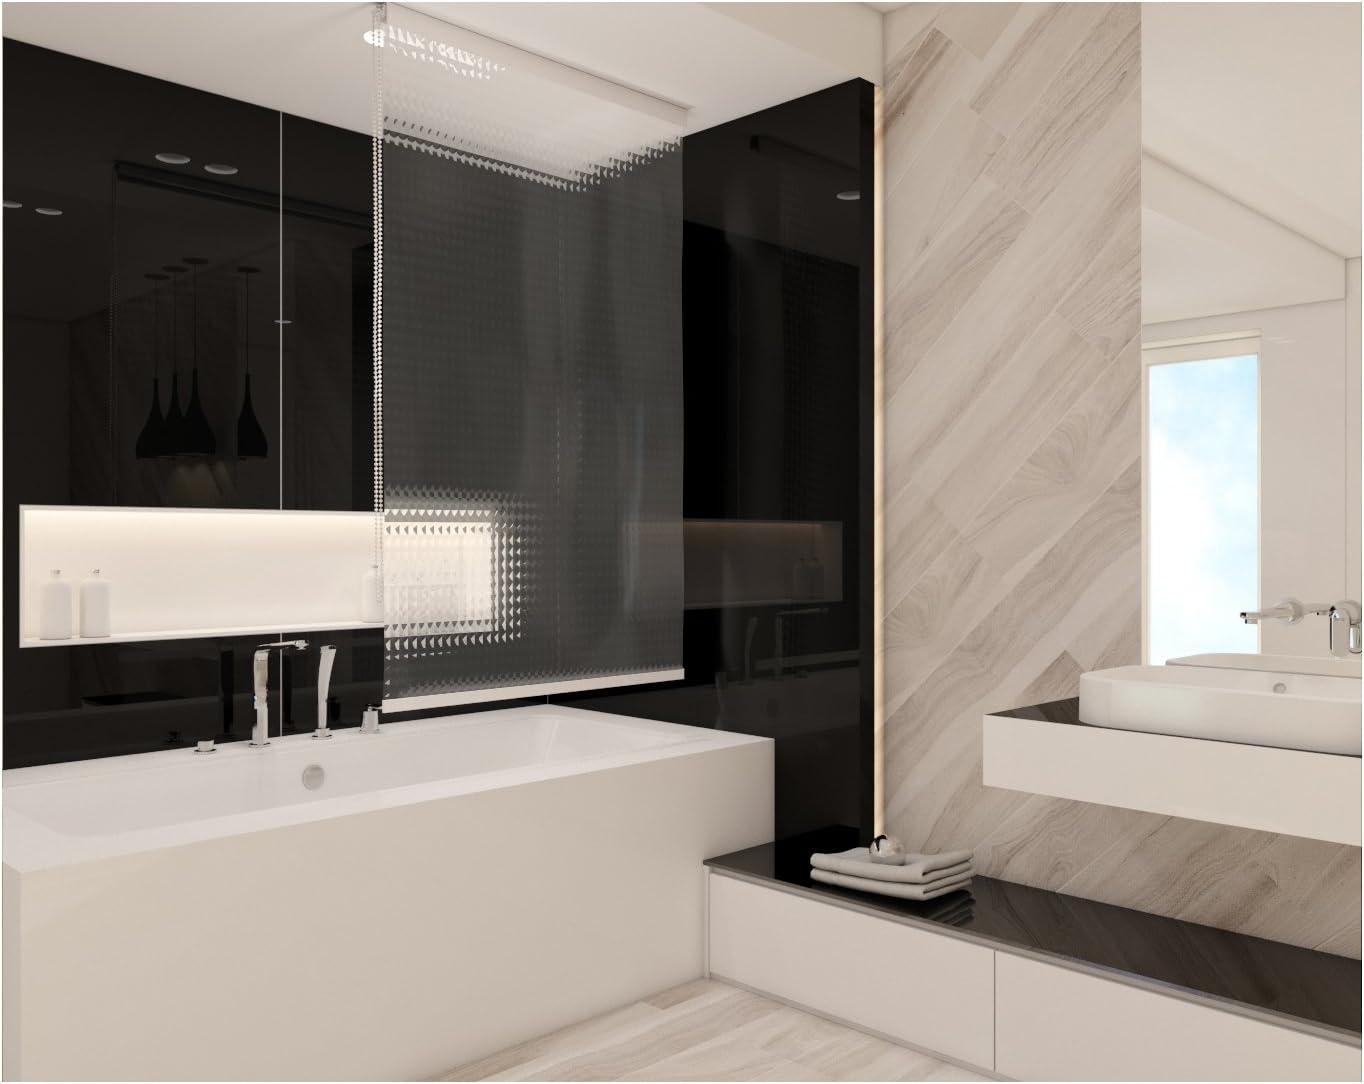 Estor de ducha (60 cm de ancho 3d aspecto mosaico transparente – Cortina de ducha (60 x 240 cm. Shower Estor Curtain: Amazon.es: Hogar